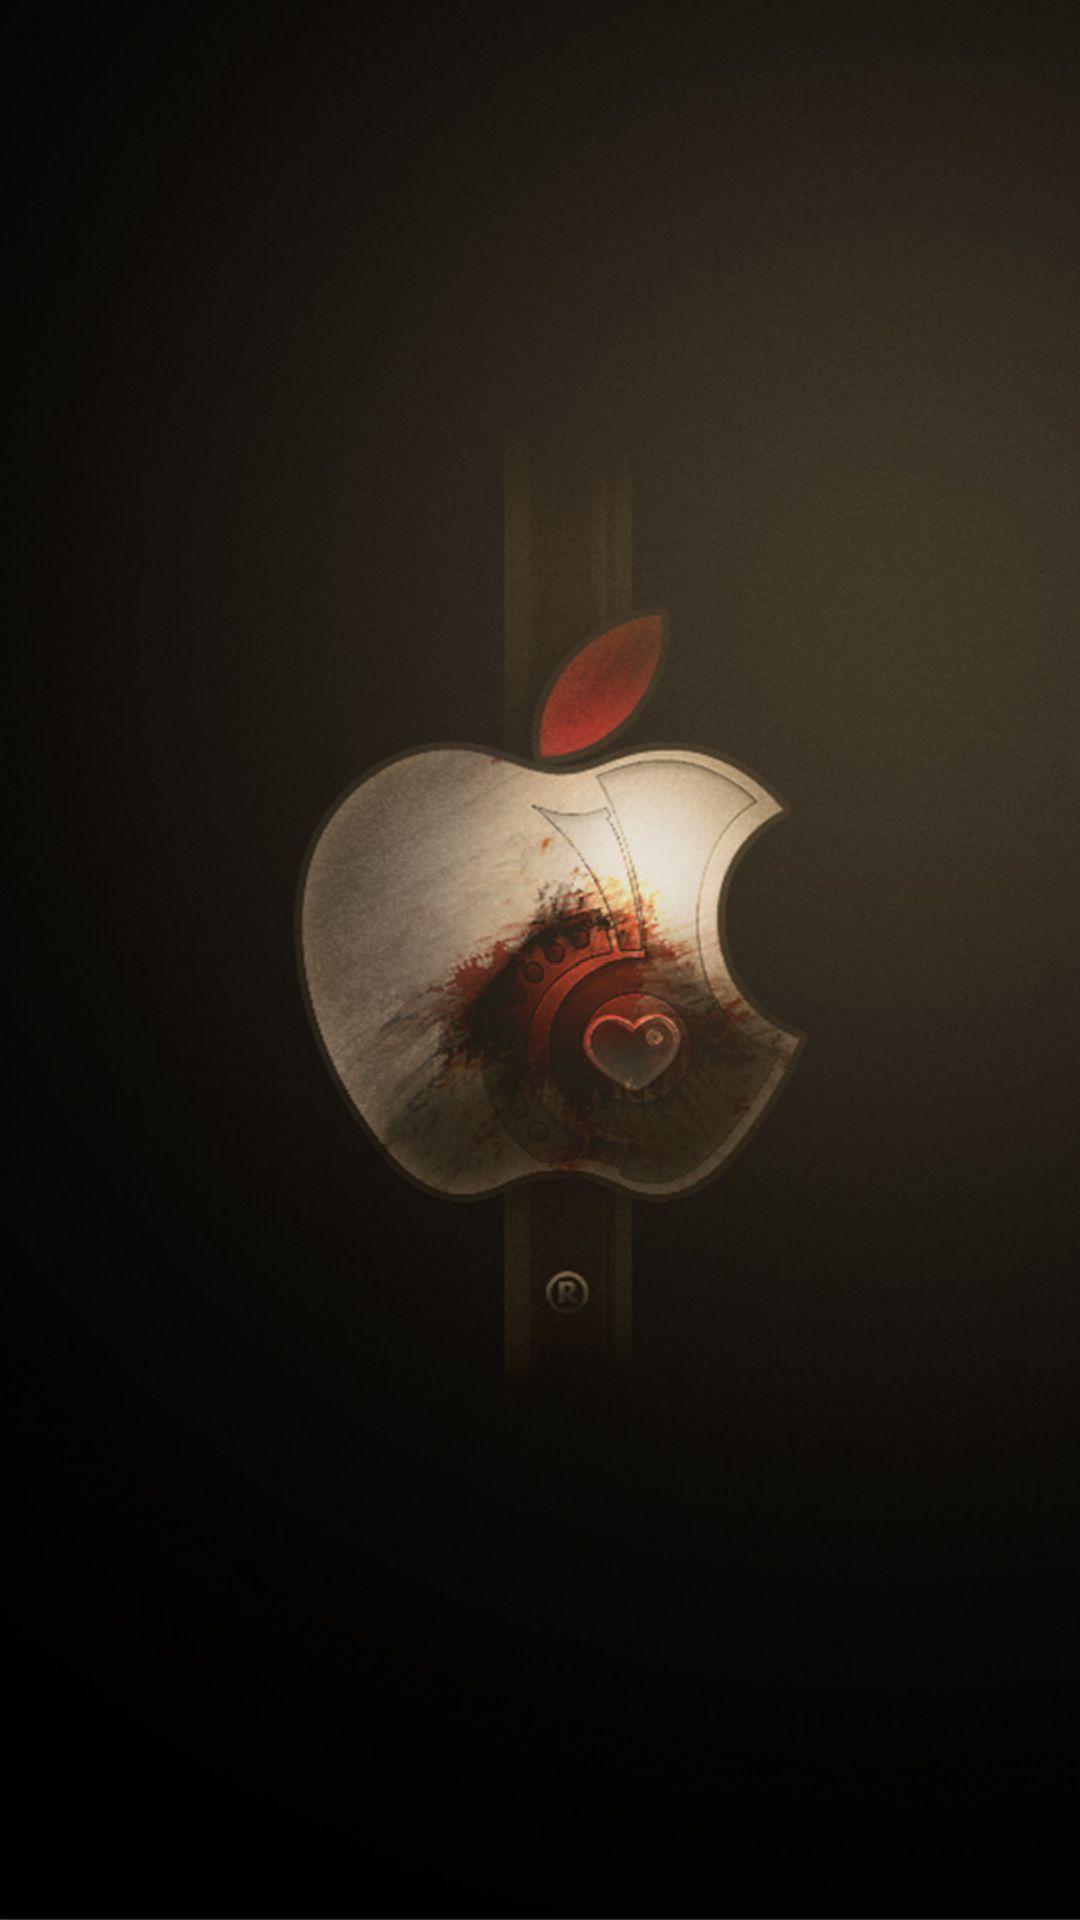 6000+ Wallpaper Apple Iphone 6  Paling Keren